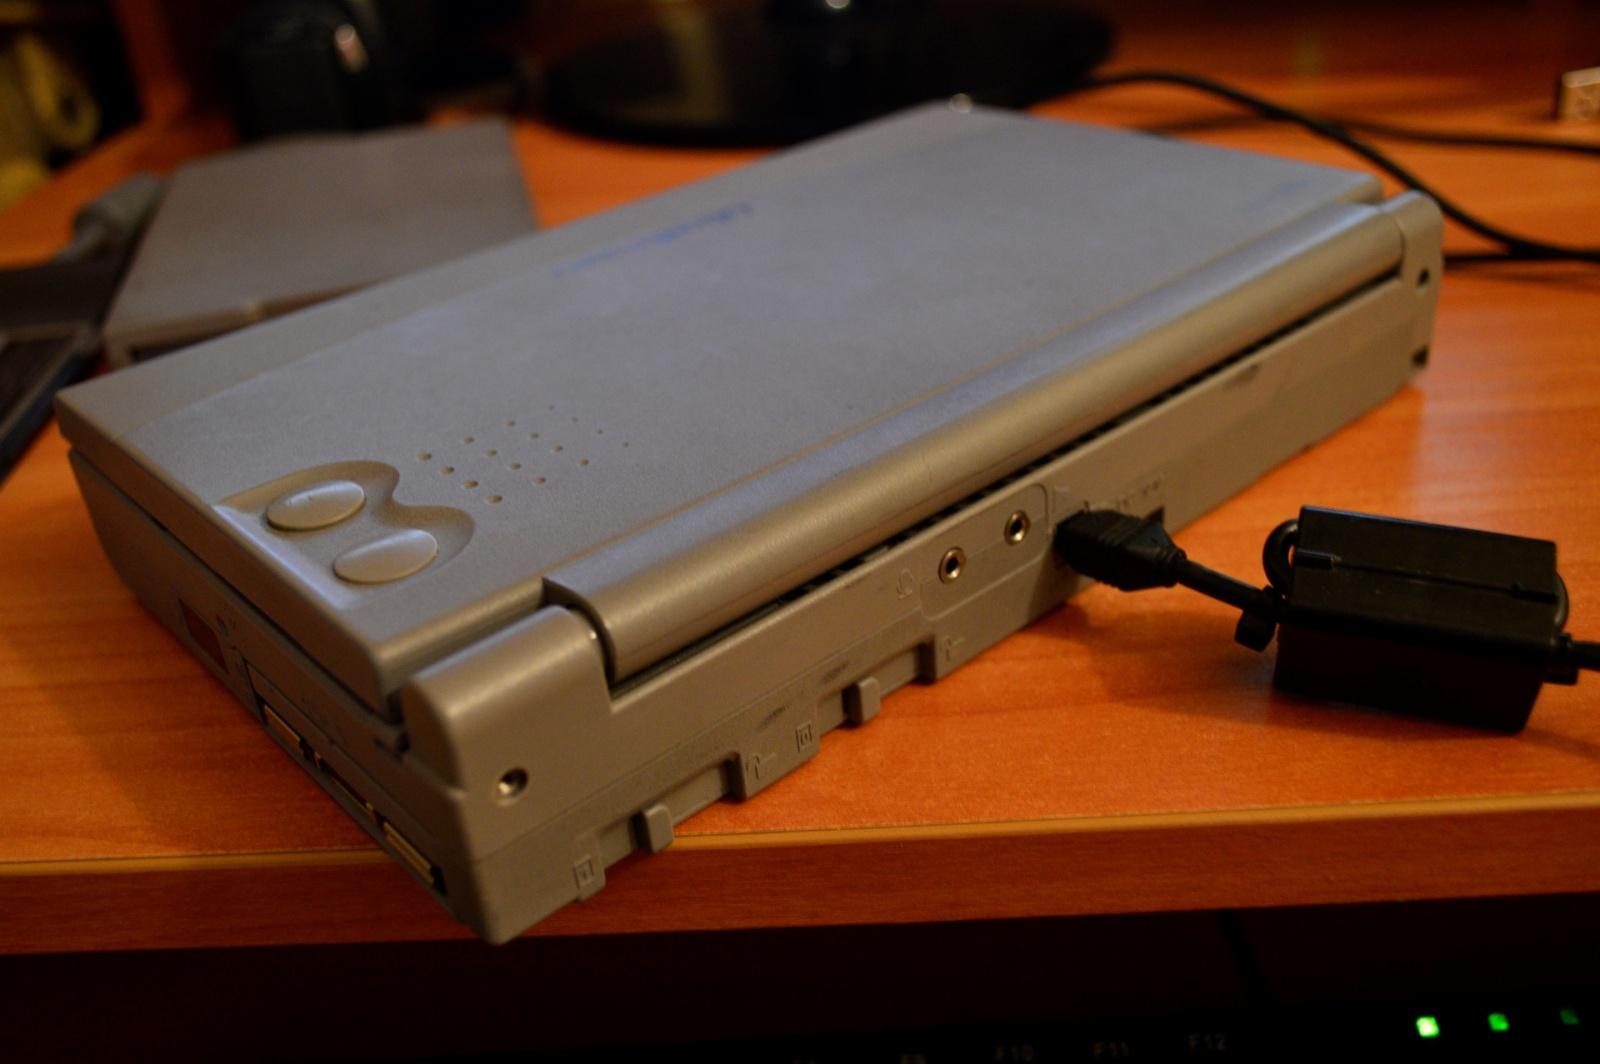 Какими были ноутбуки 20 лет назад на примере Toshiba libretto 100ct - 12